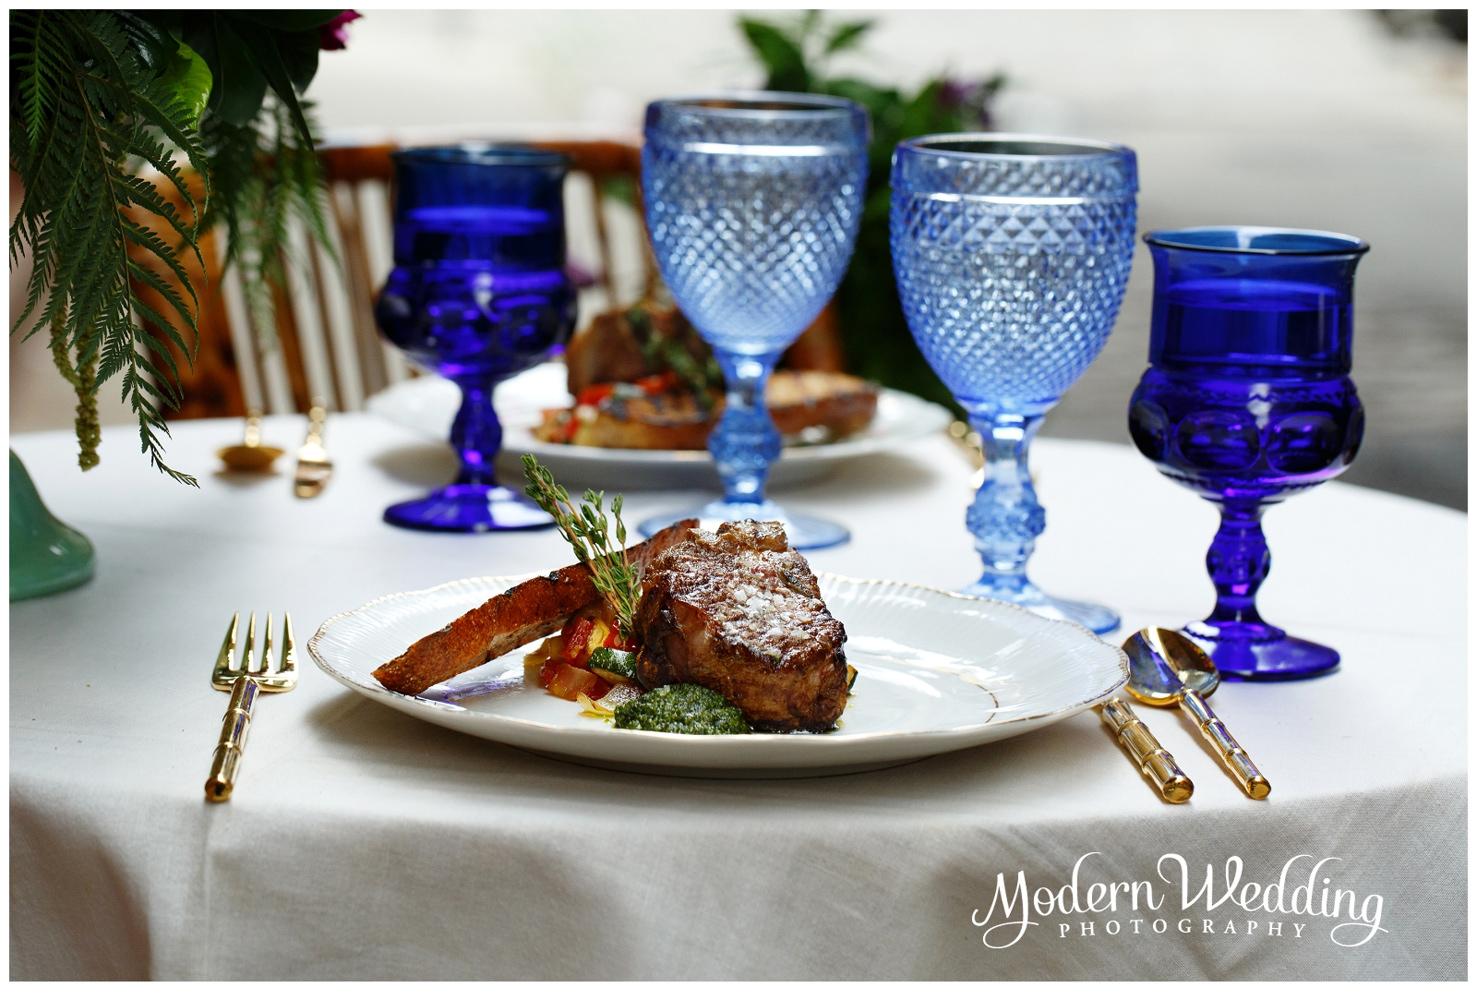 Modern Wedding Photography 33